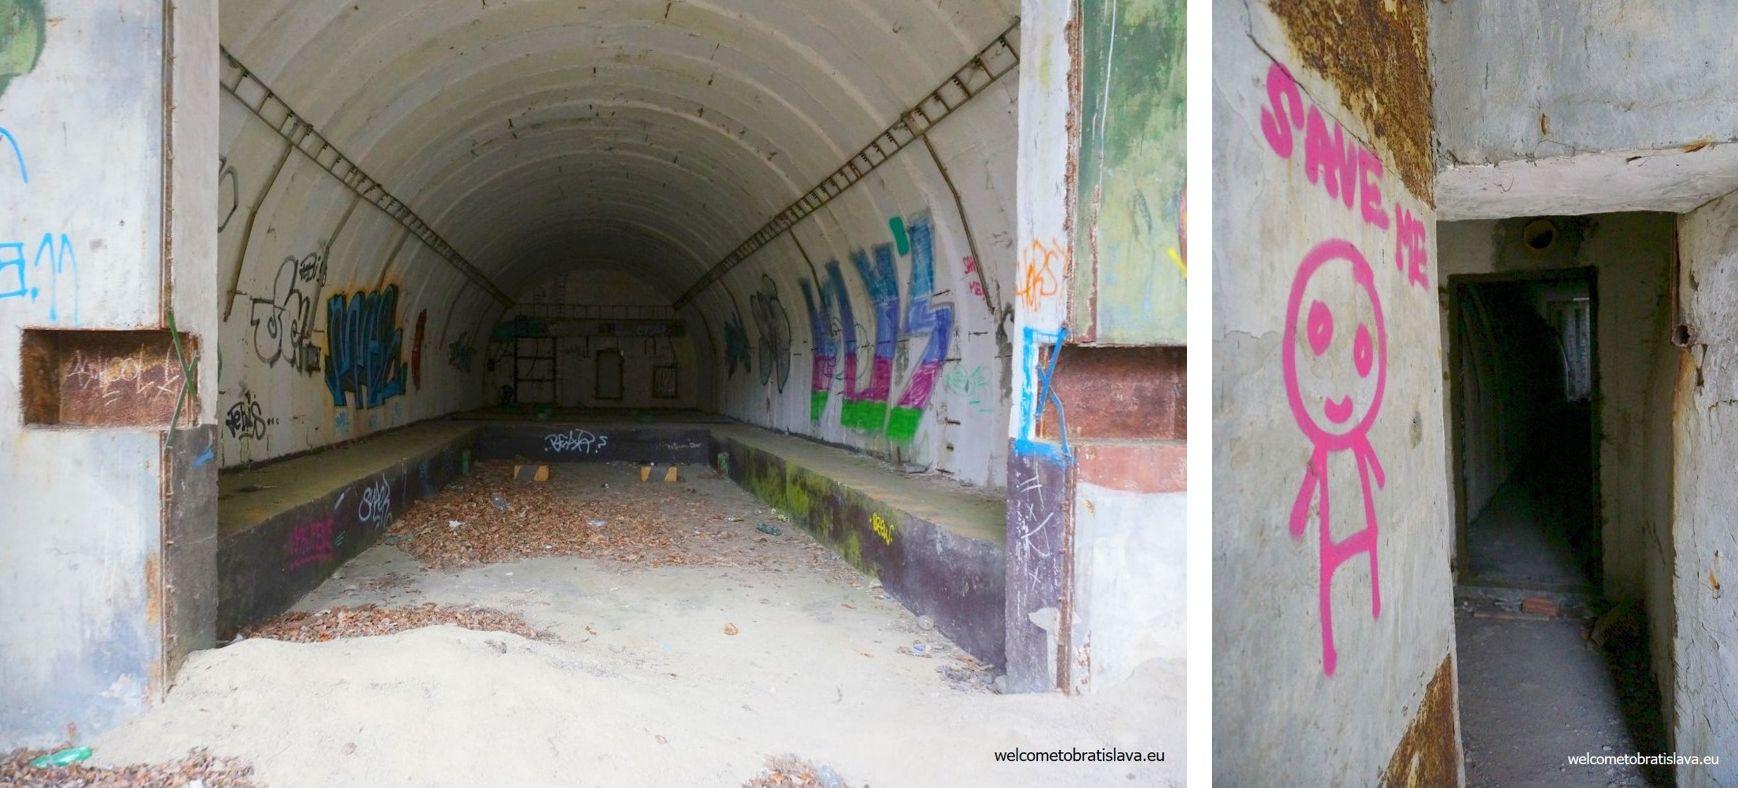 Devin bunker